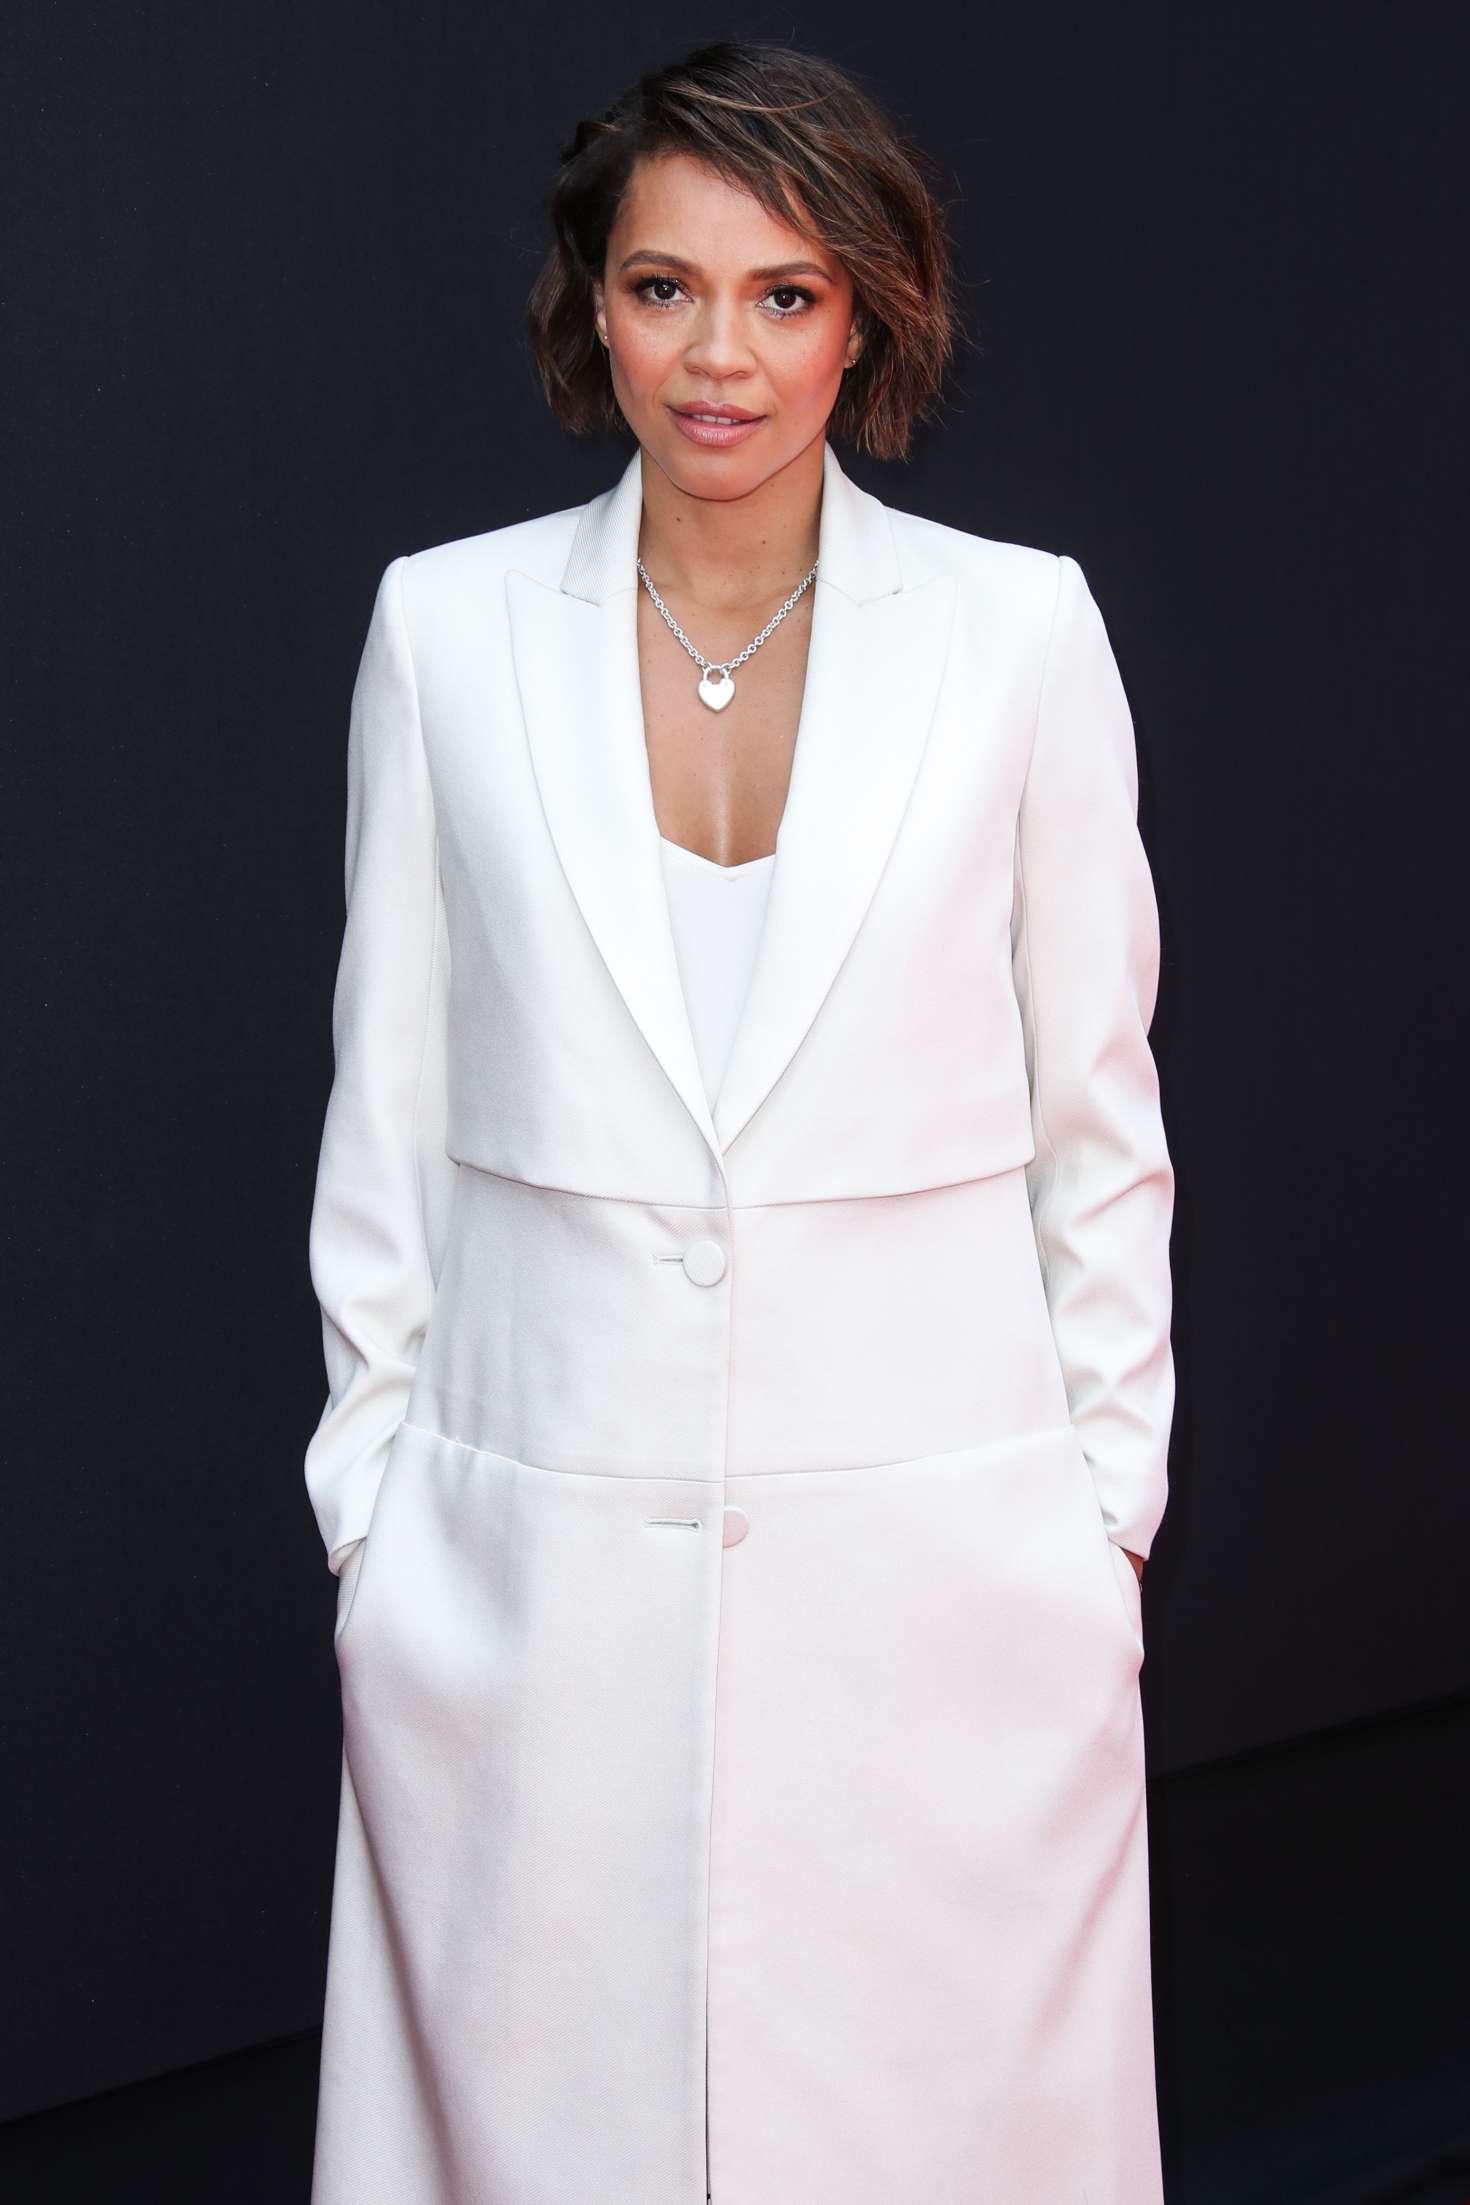 Carmen Ejogo 2017 : Carmen Ejogo at Sir Ridley Scott hand and footprint ceremony -15